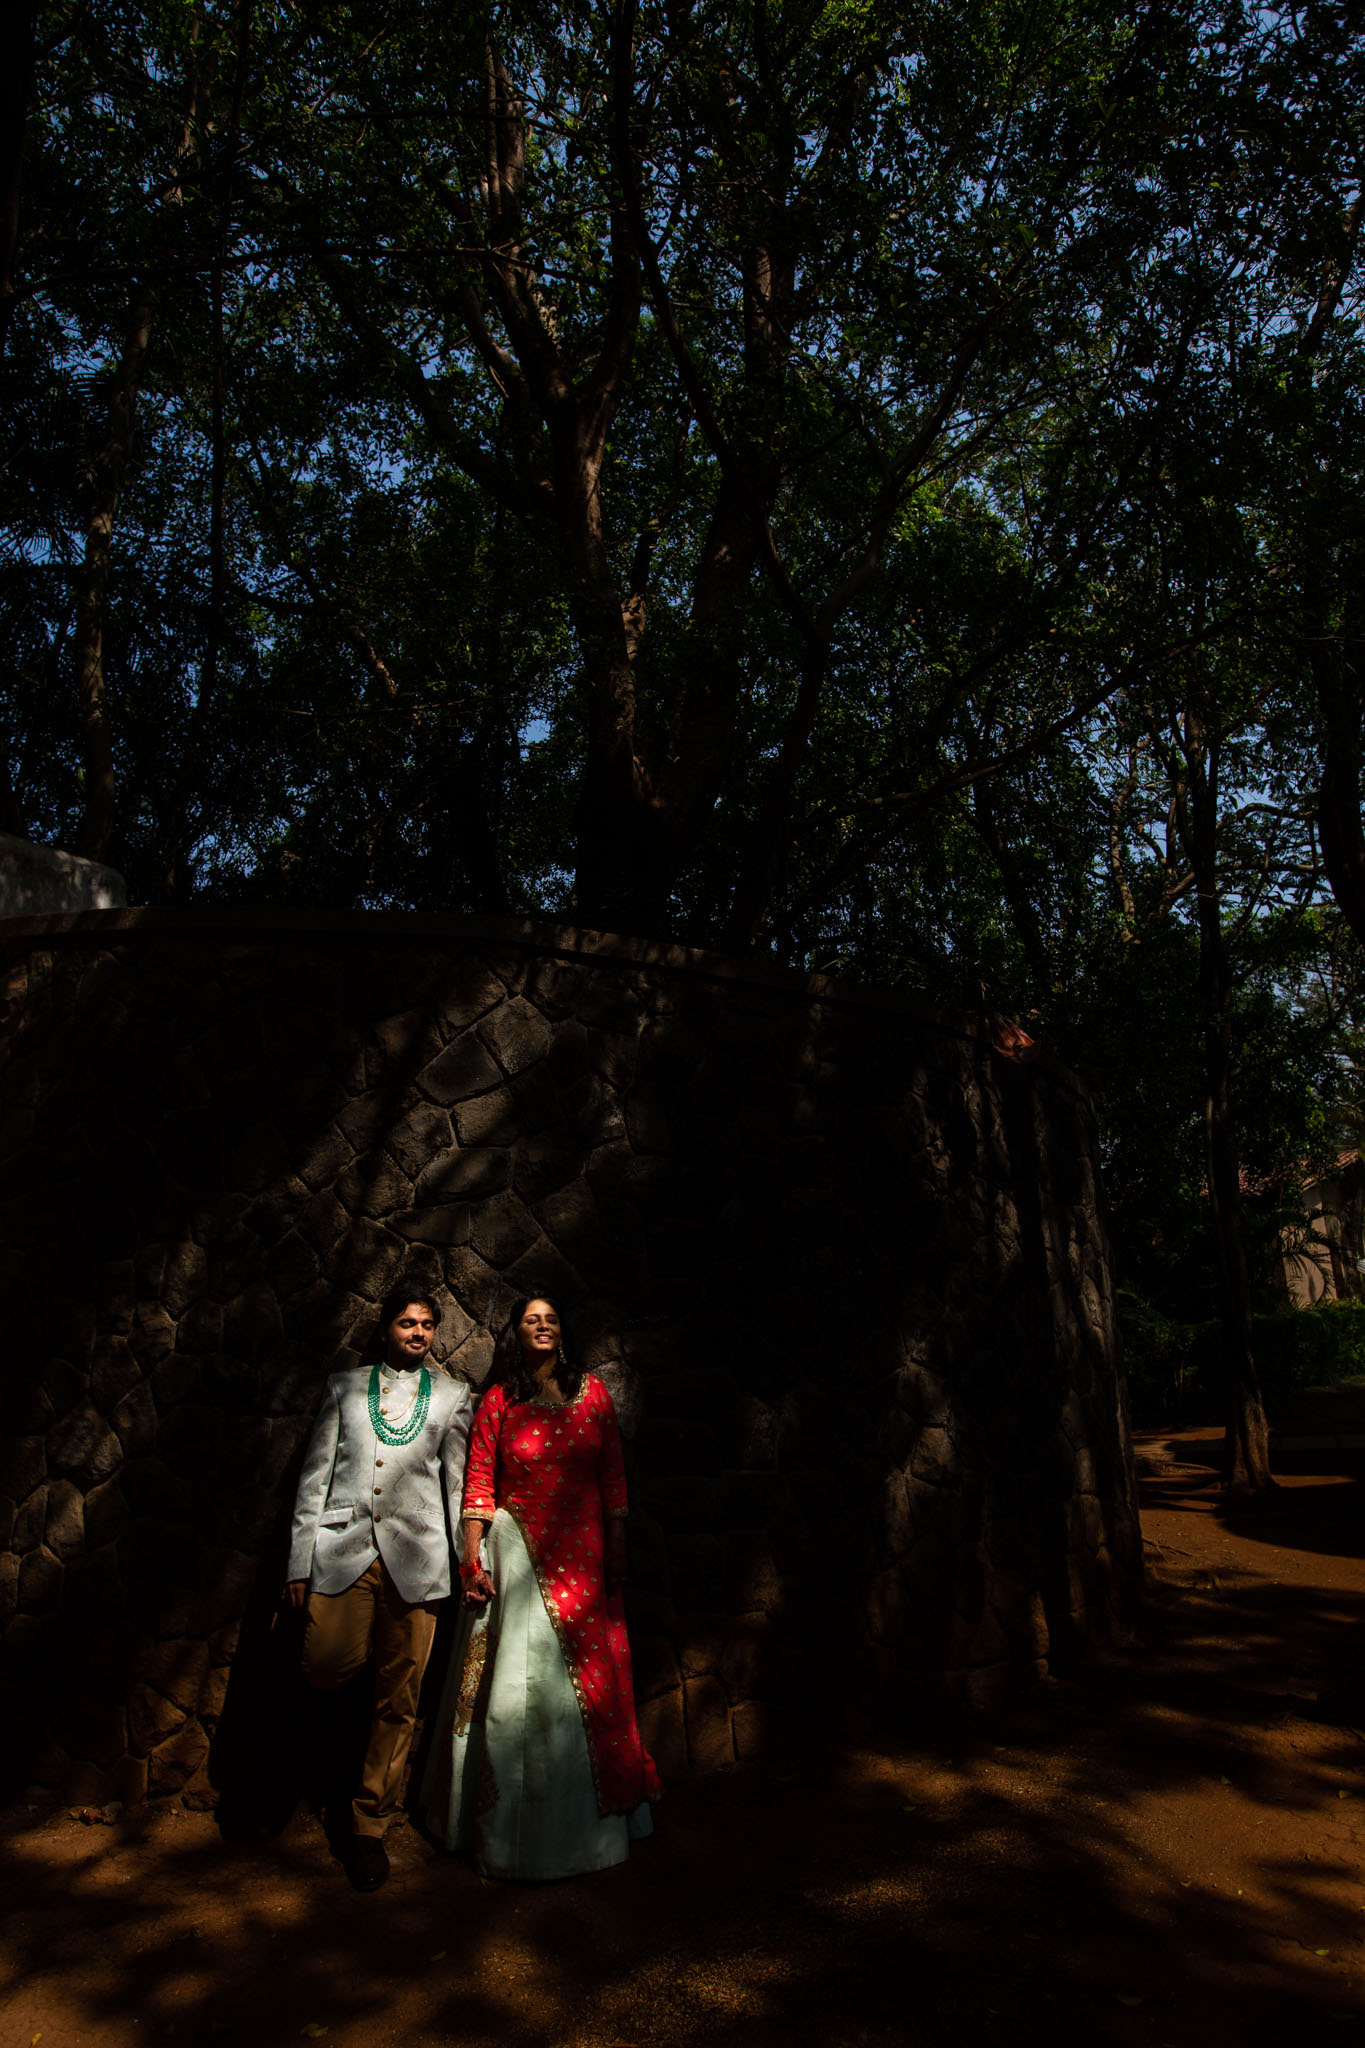 Mukti x Ojas Wedding Akshjay Sansare Photography Best wedding photographer in mumbai India Candid Cinematic Films videos-5.jpg